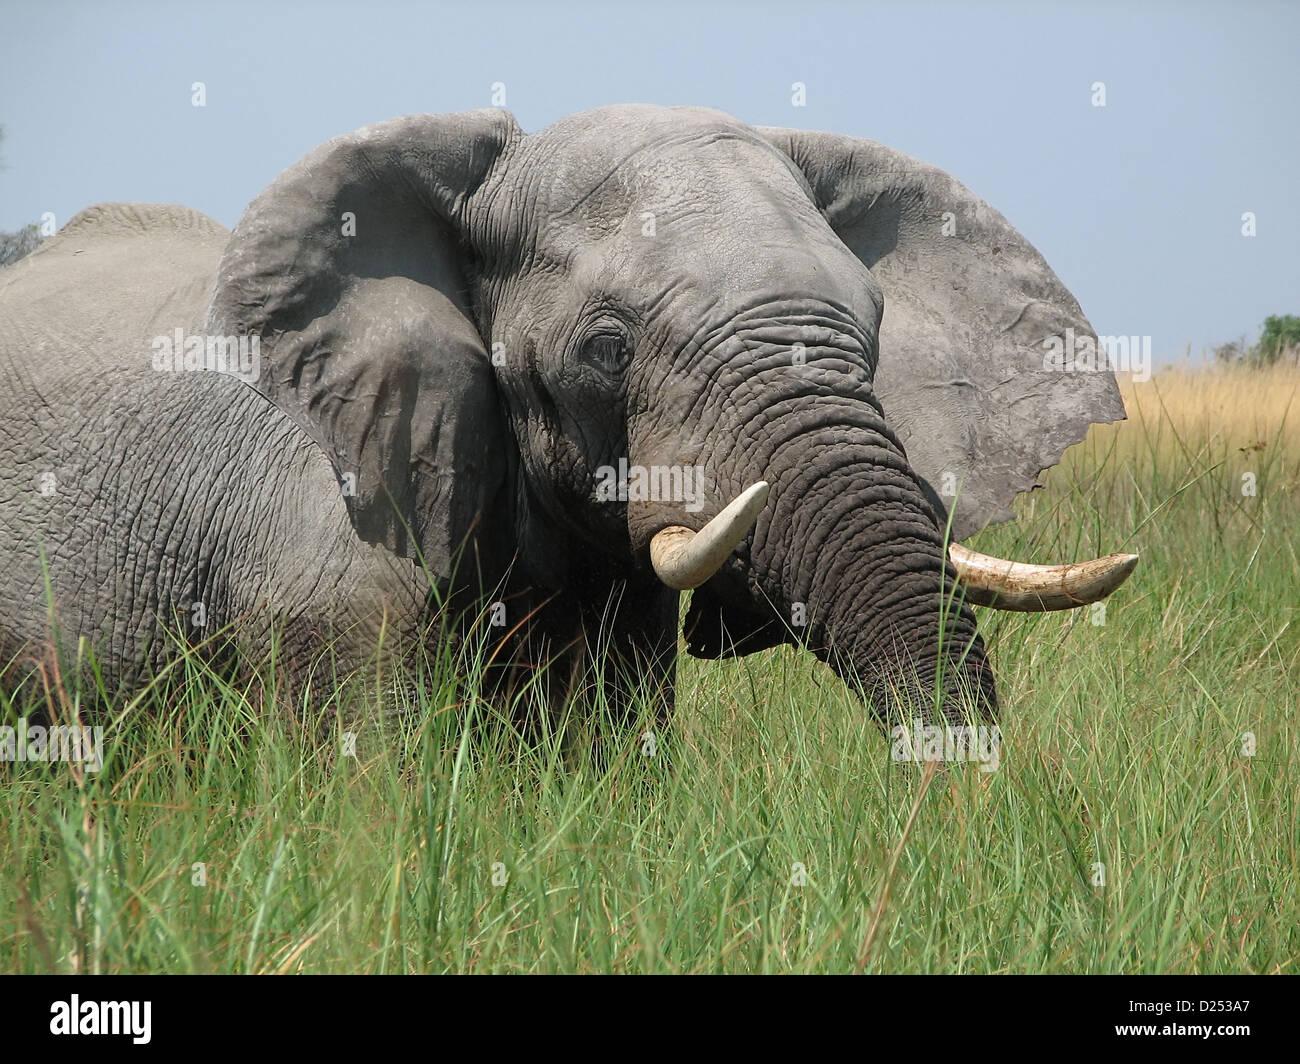 Elephant in the Okavango Delta Botswana - Stock Image